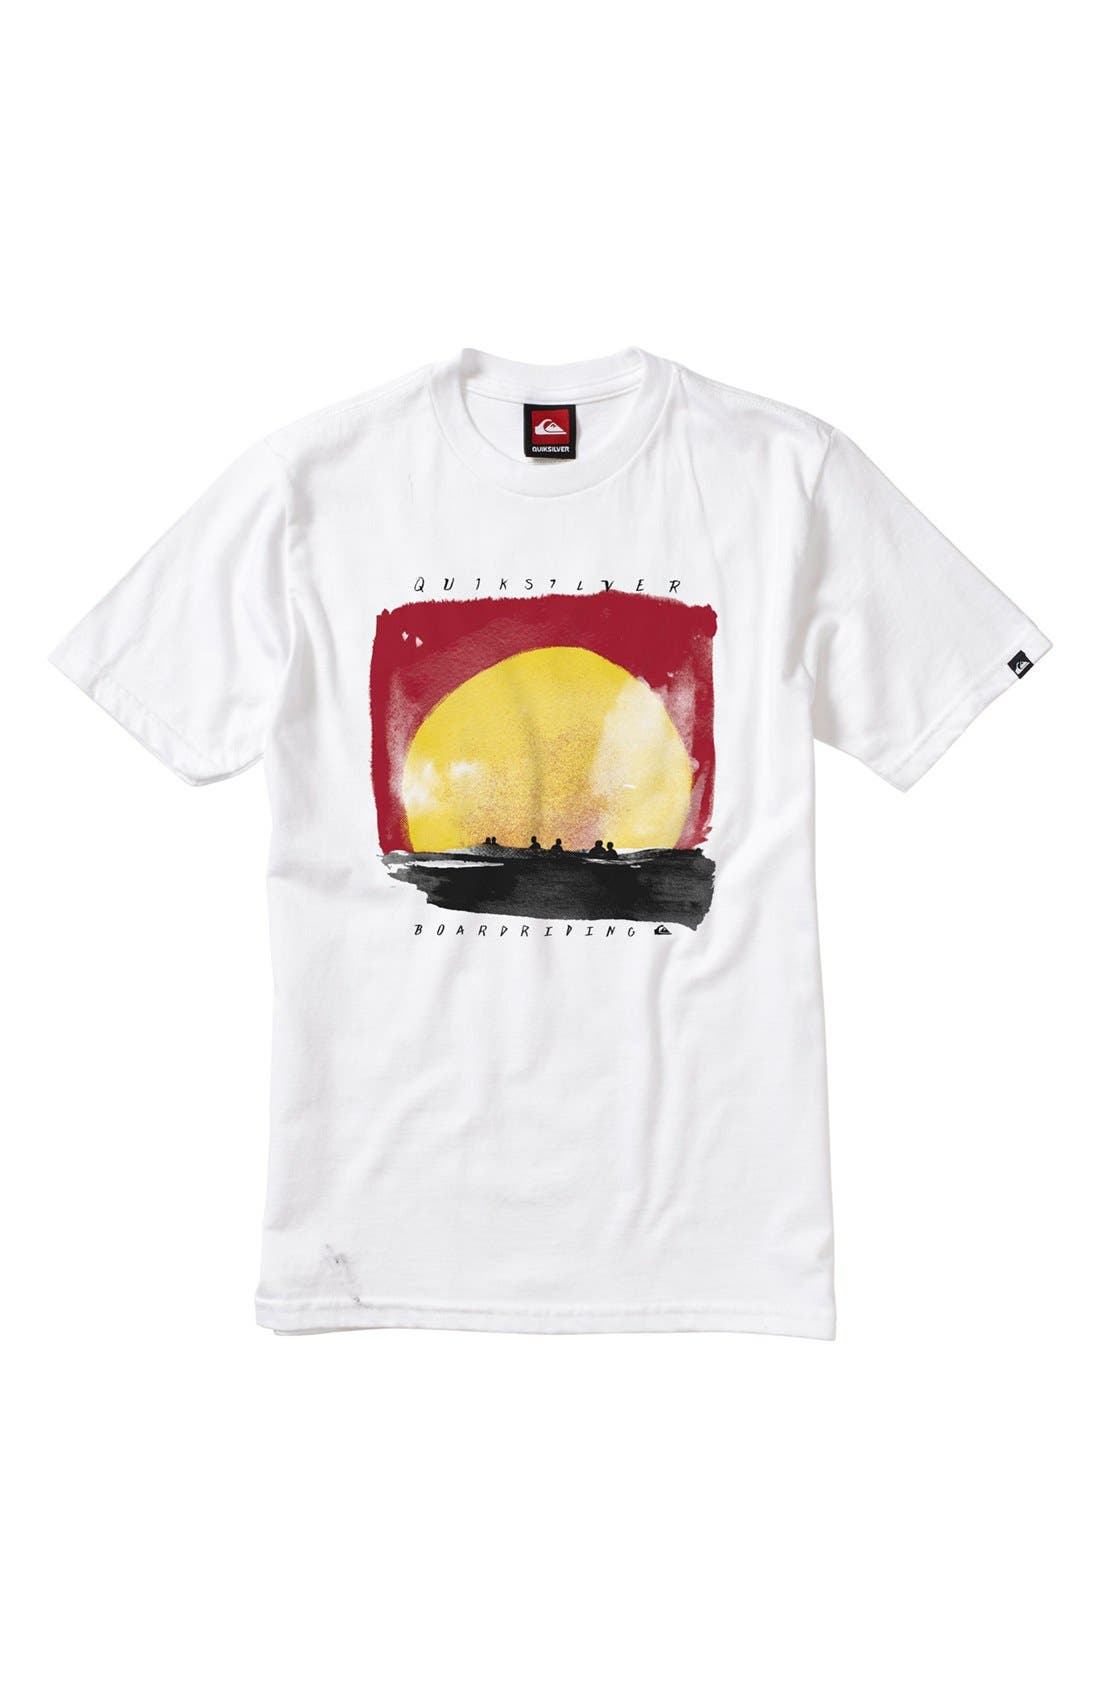 Alternate Image 1 Selected - Quiksilver 'Sets' T-Shirt (Little Boys)